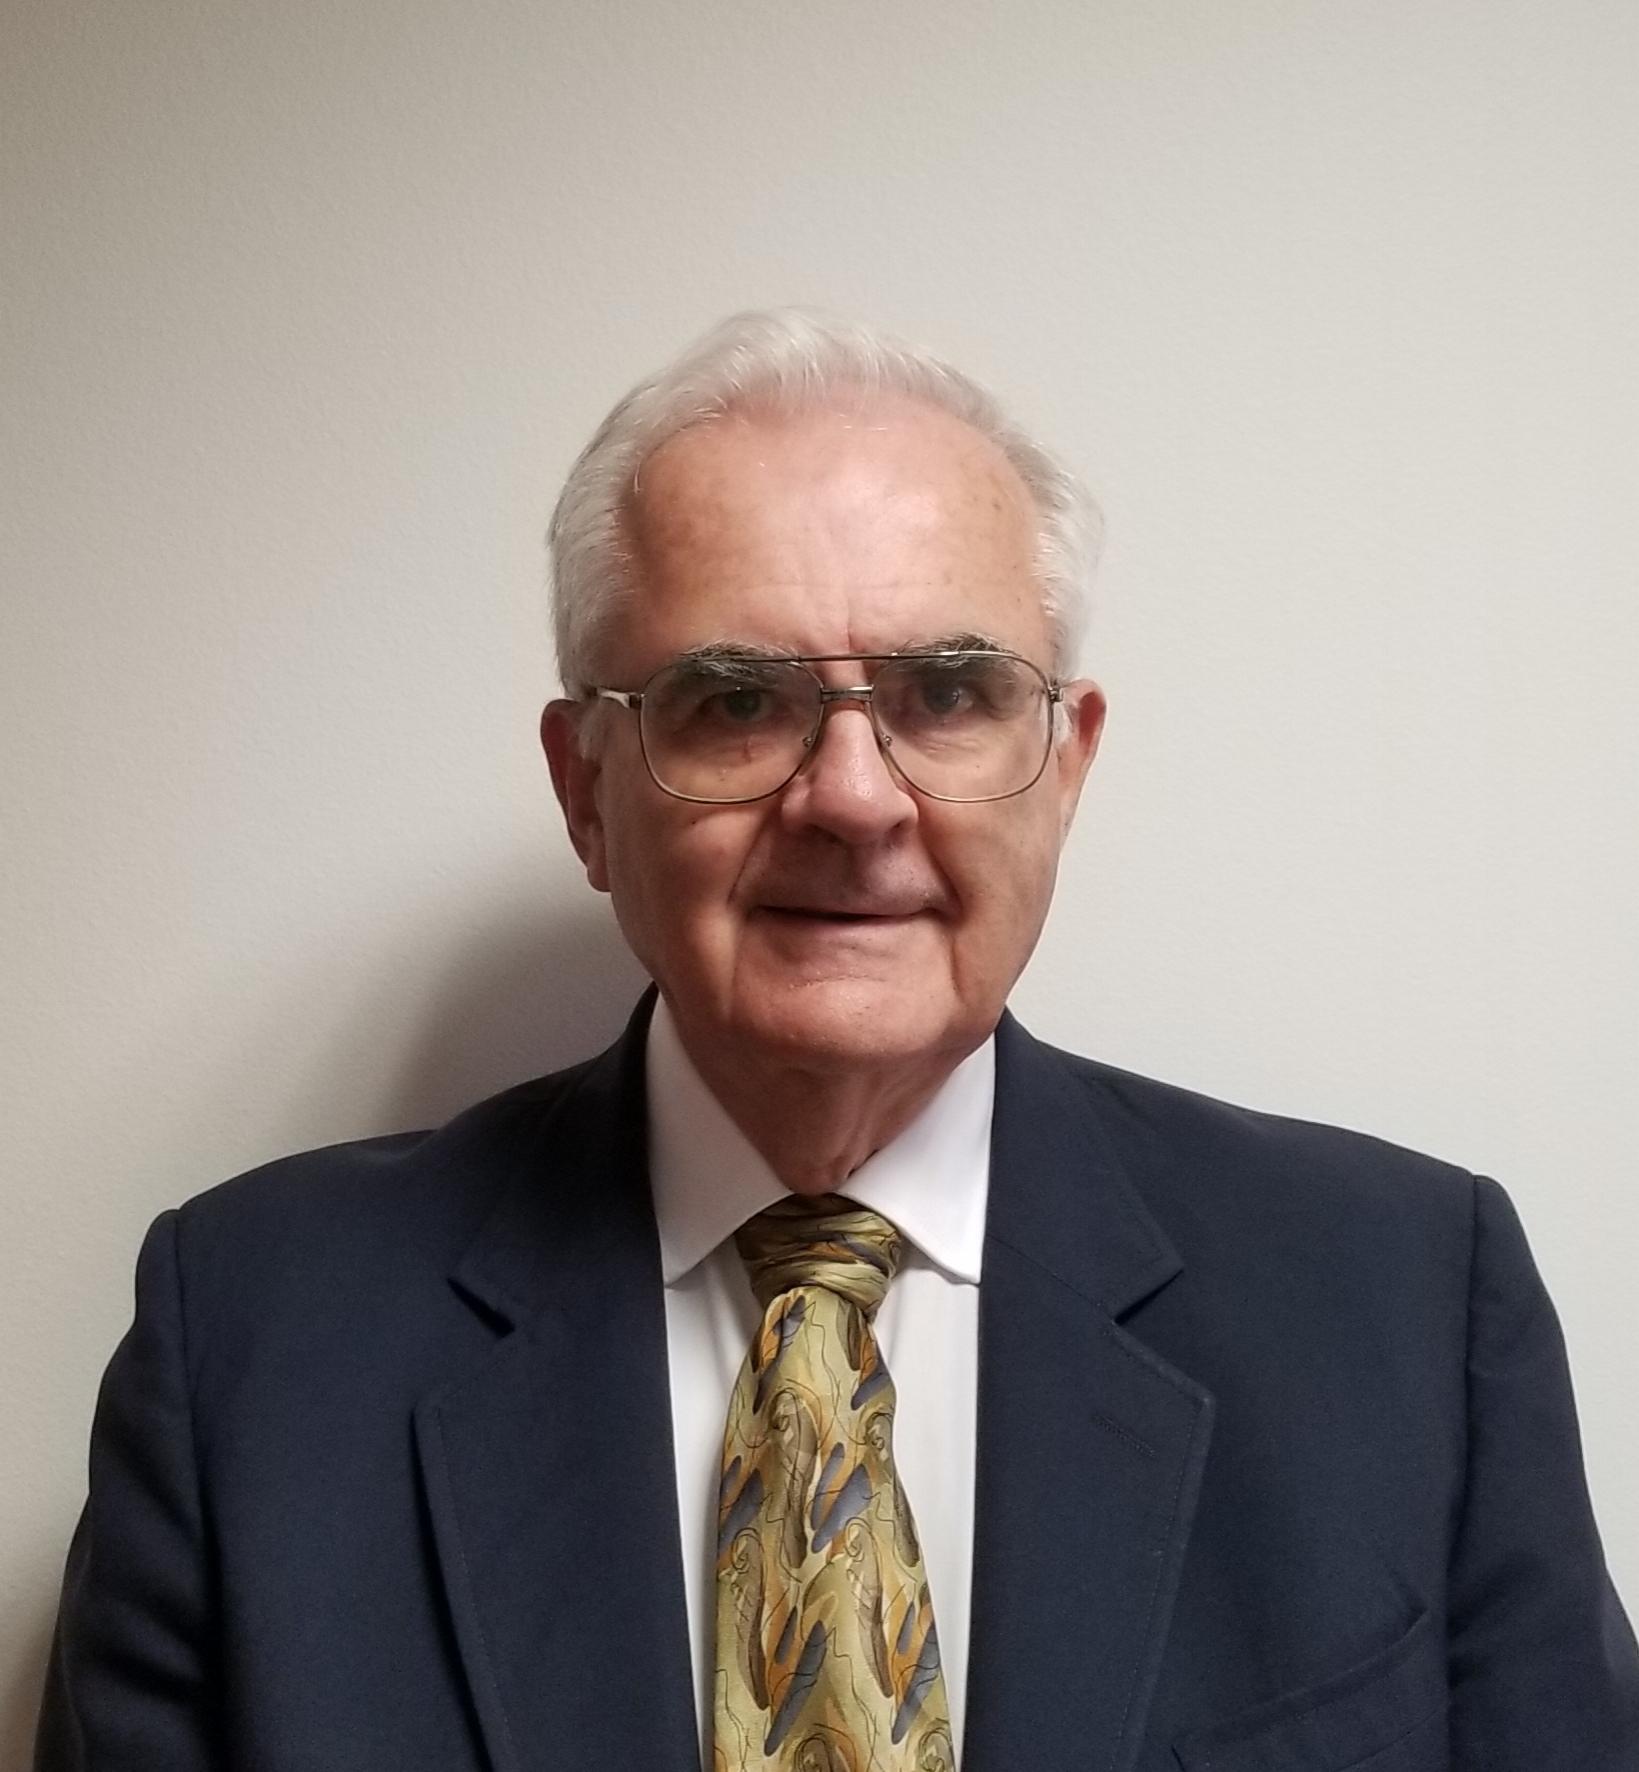 Robert (Bob) Babbitt, REA - Project Manager, Water/Wastewater